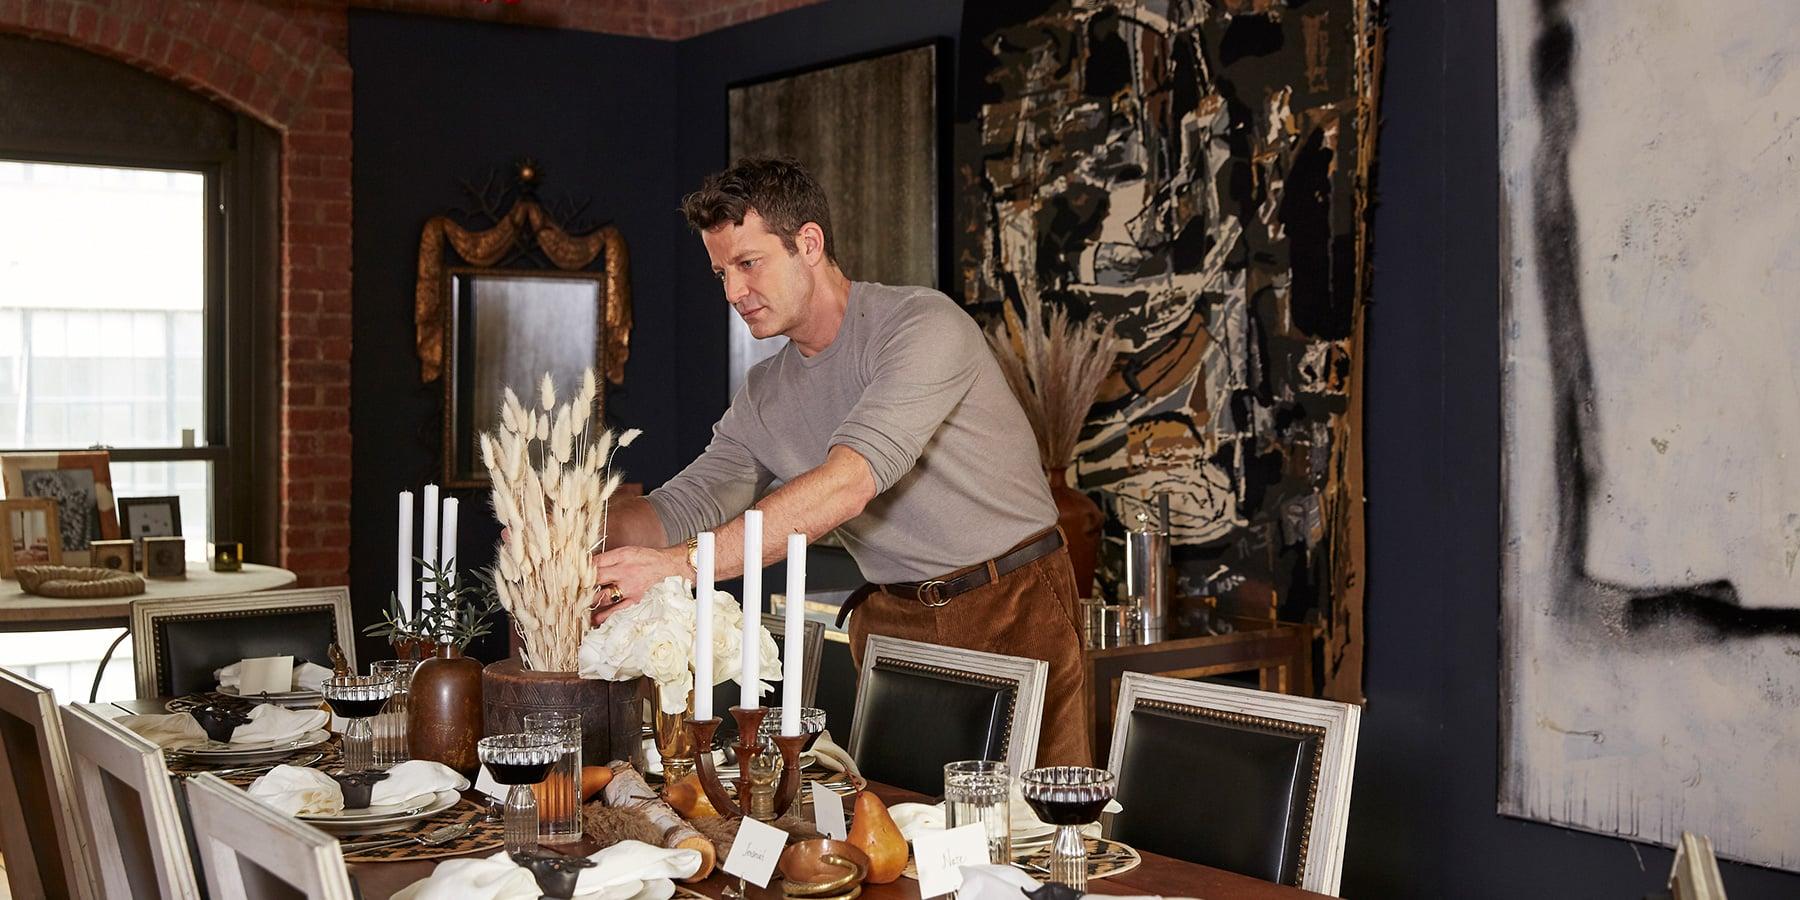 Nate Berkus decorating a table